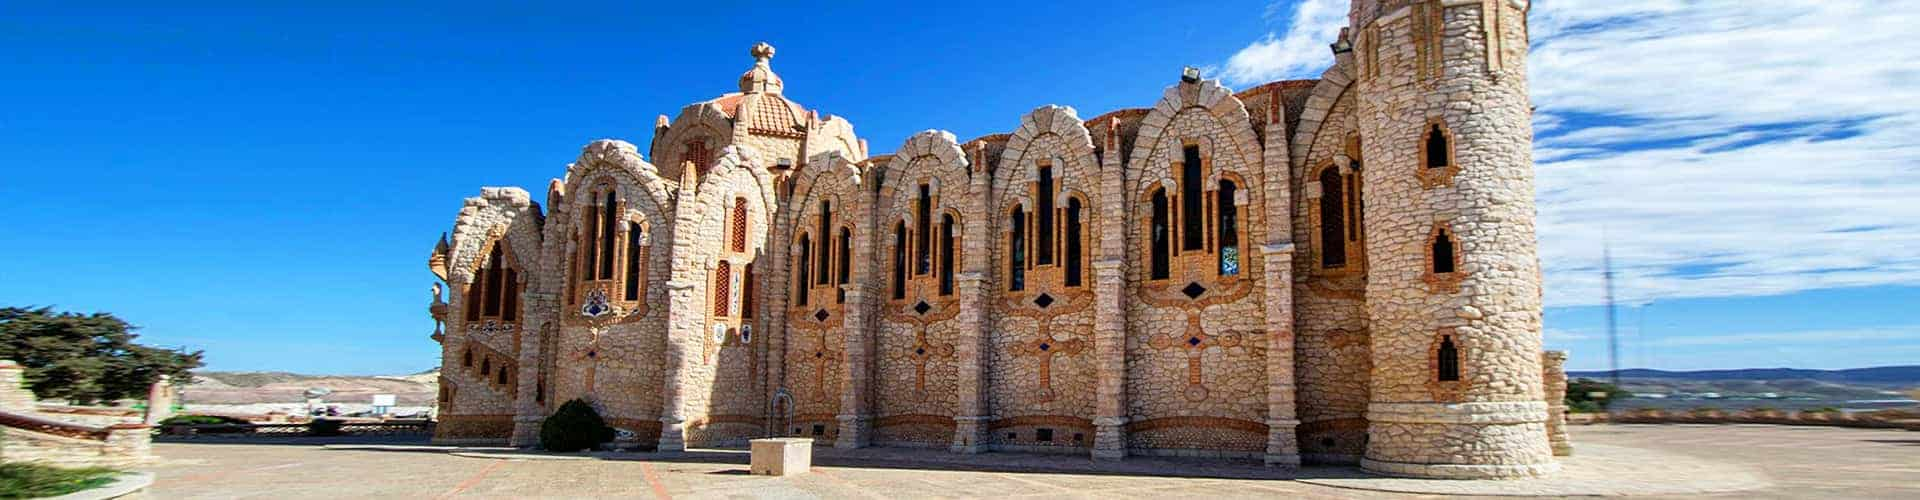 Free tours en Novelda - Turismo en Alicante